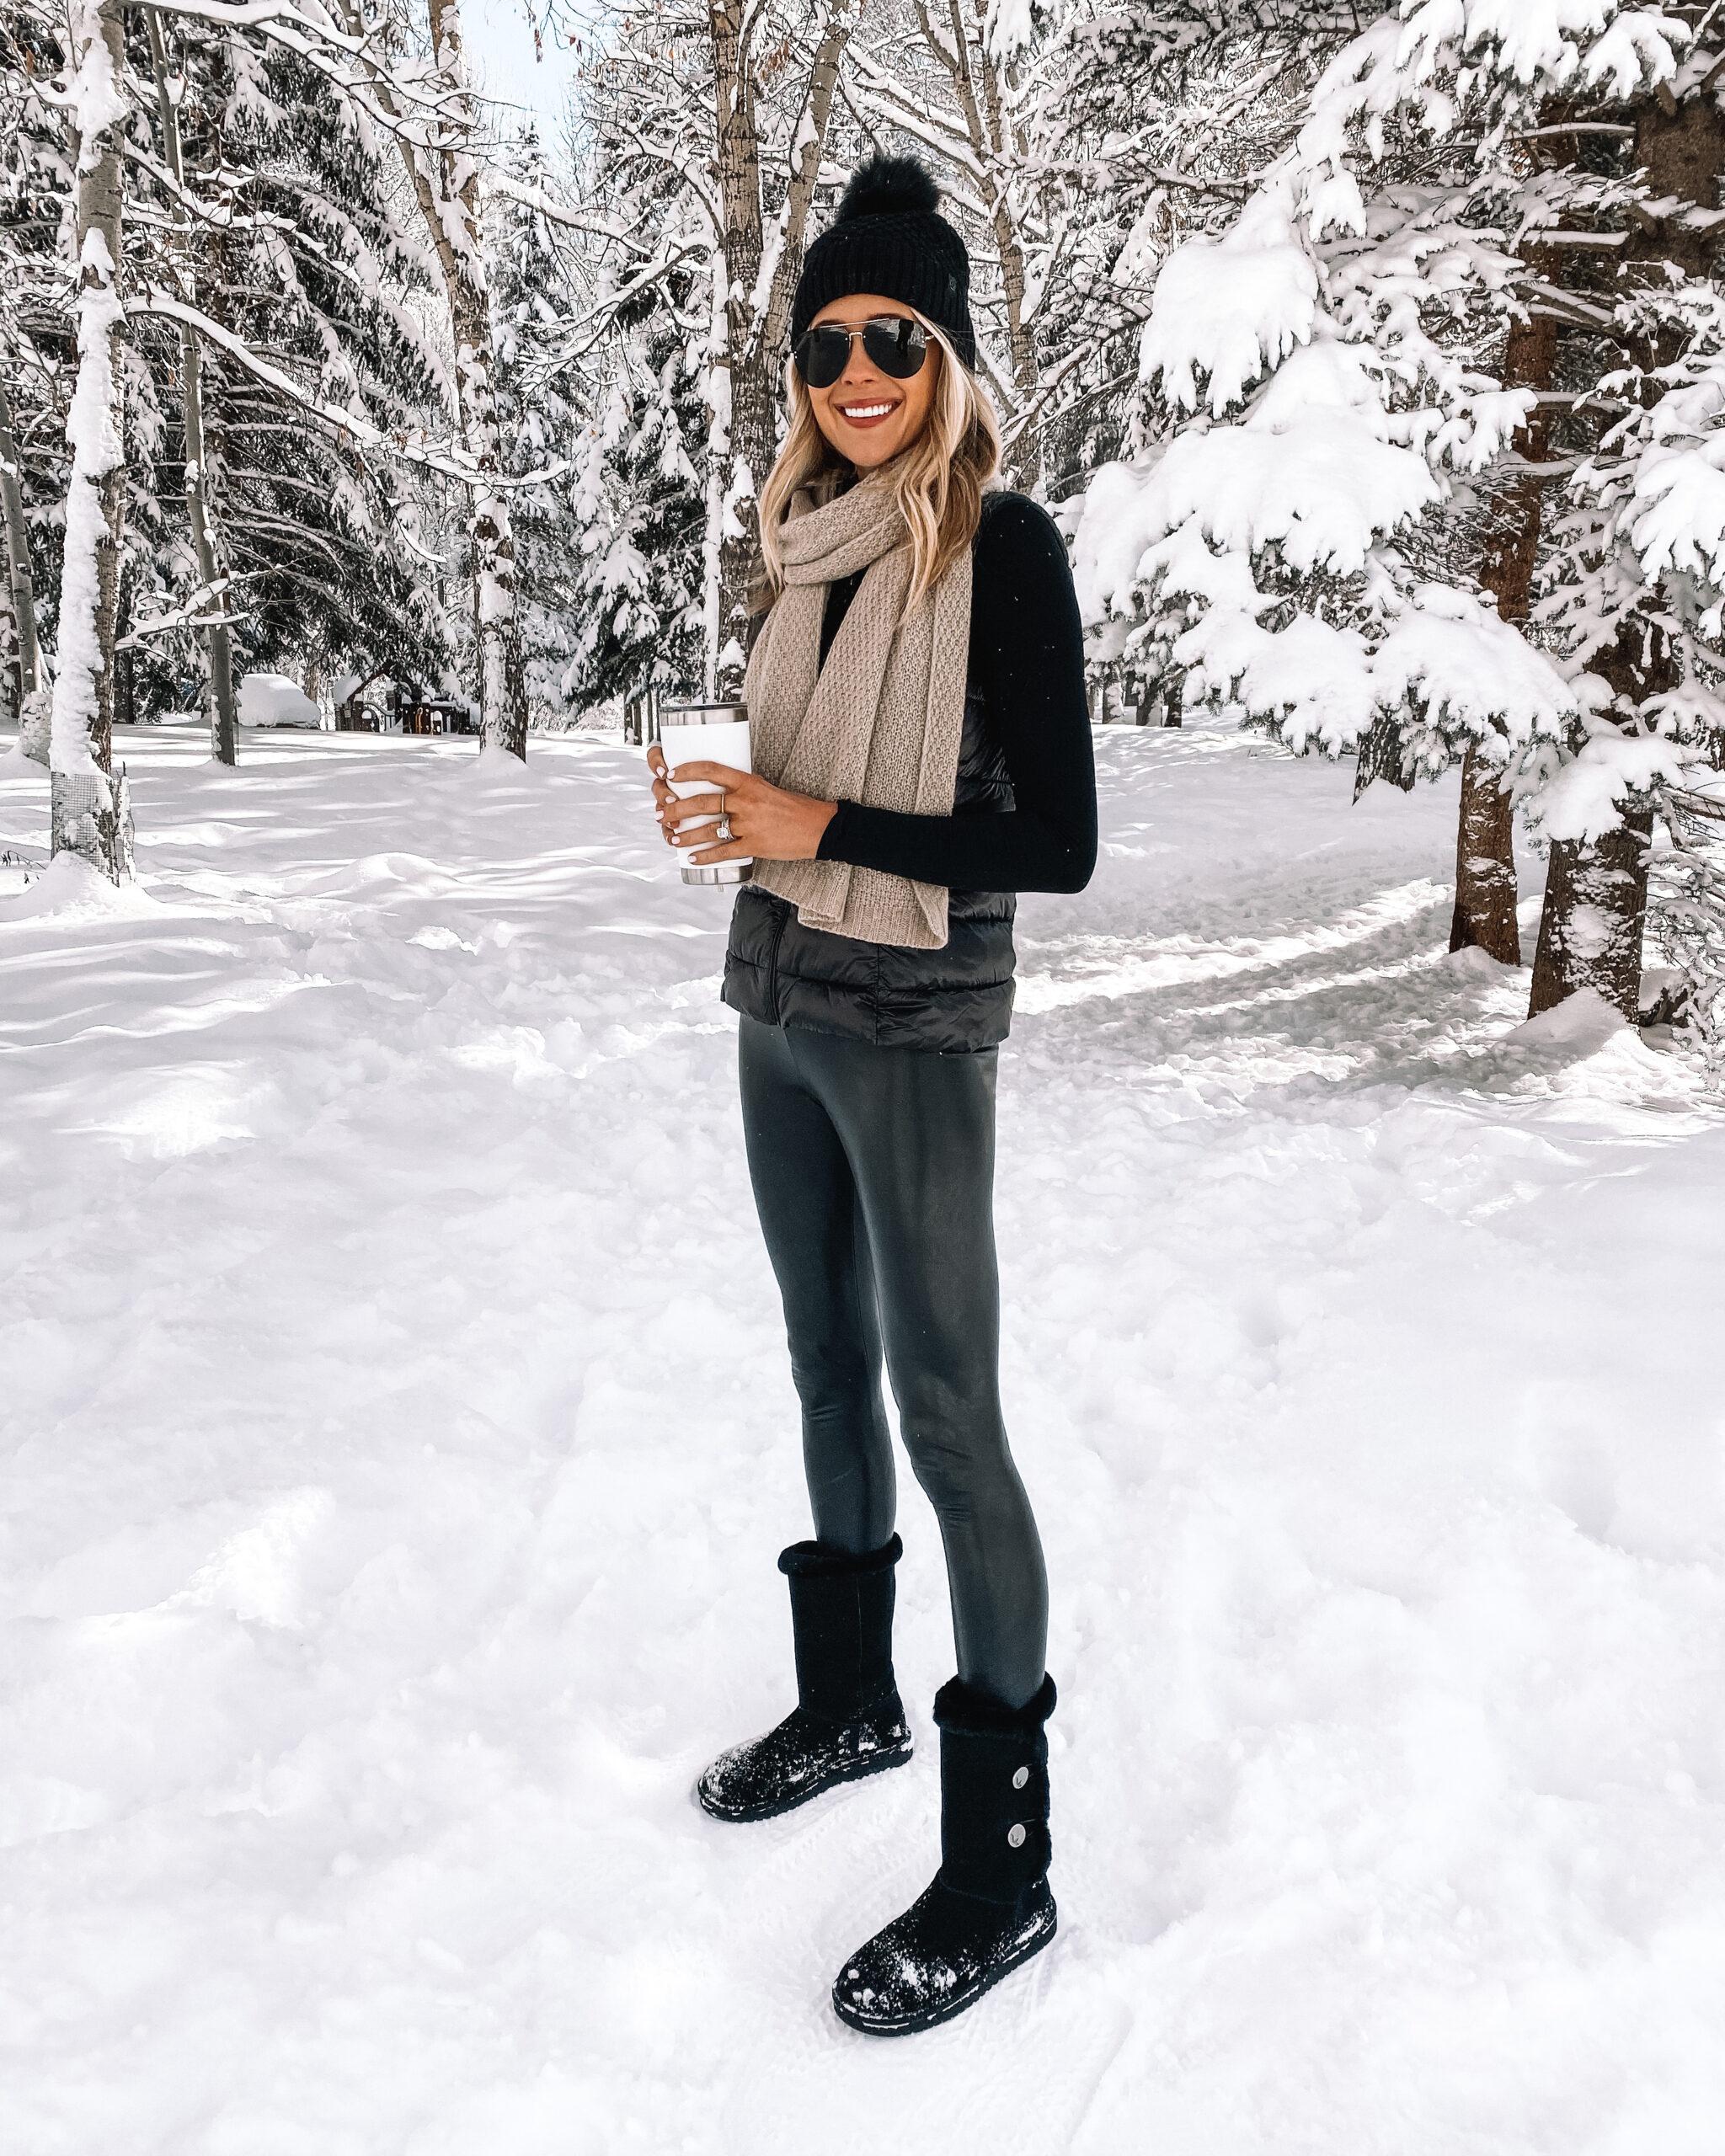 Fashion Jackson Wearing Commando Faux Leather Leggings Winter Outfit Black Puffer Vest Camel Scarf Black Beanie Black Snow Boots